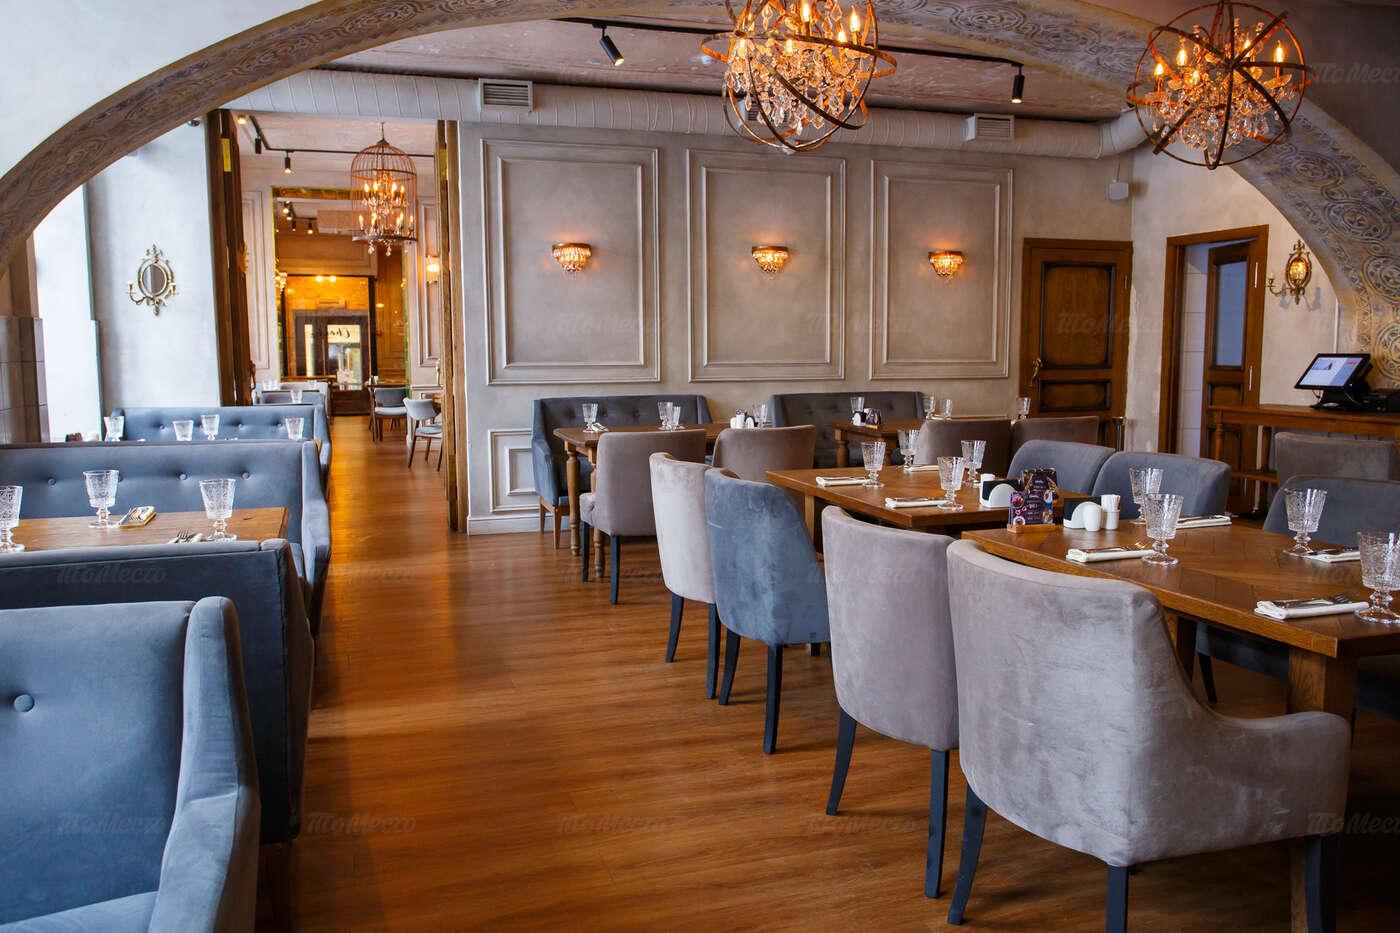 Ресторан Чача на набережной канала Грибоедова фото 4